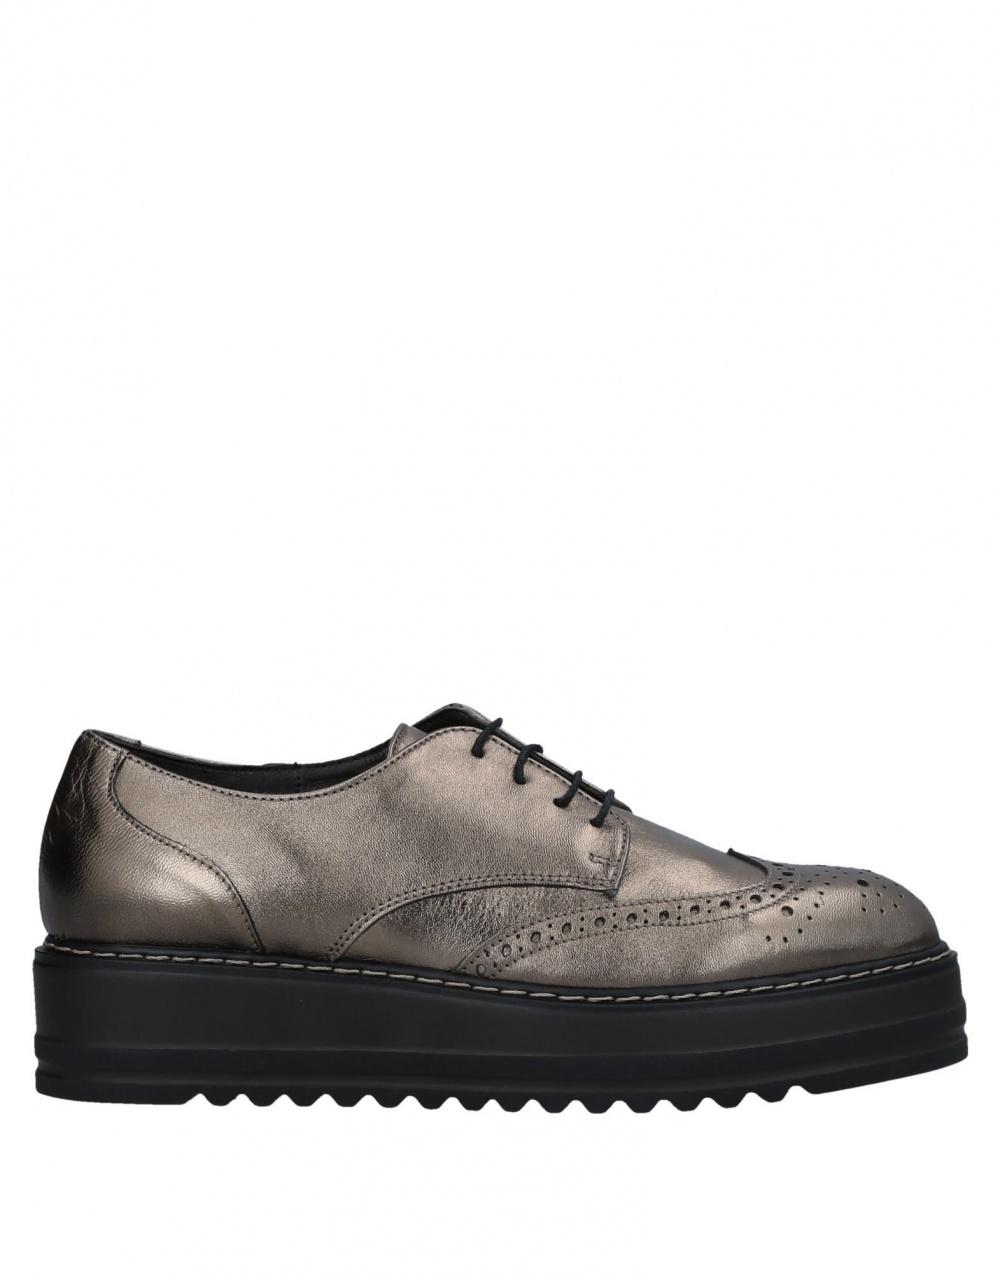 Ботинки Elenia Bucci. 39